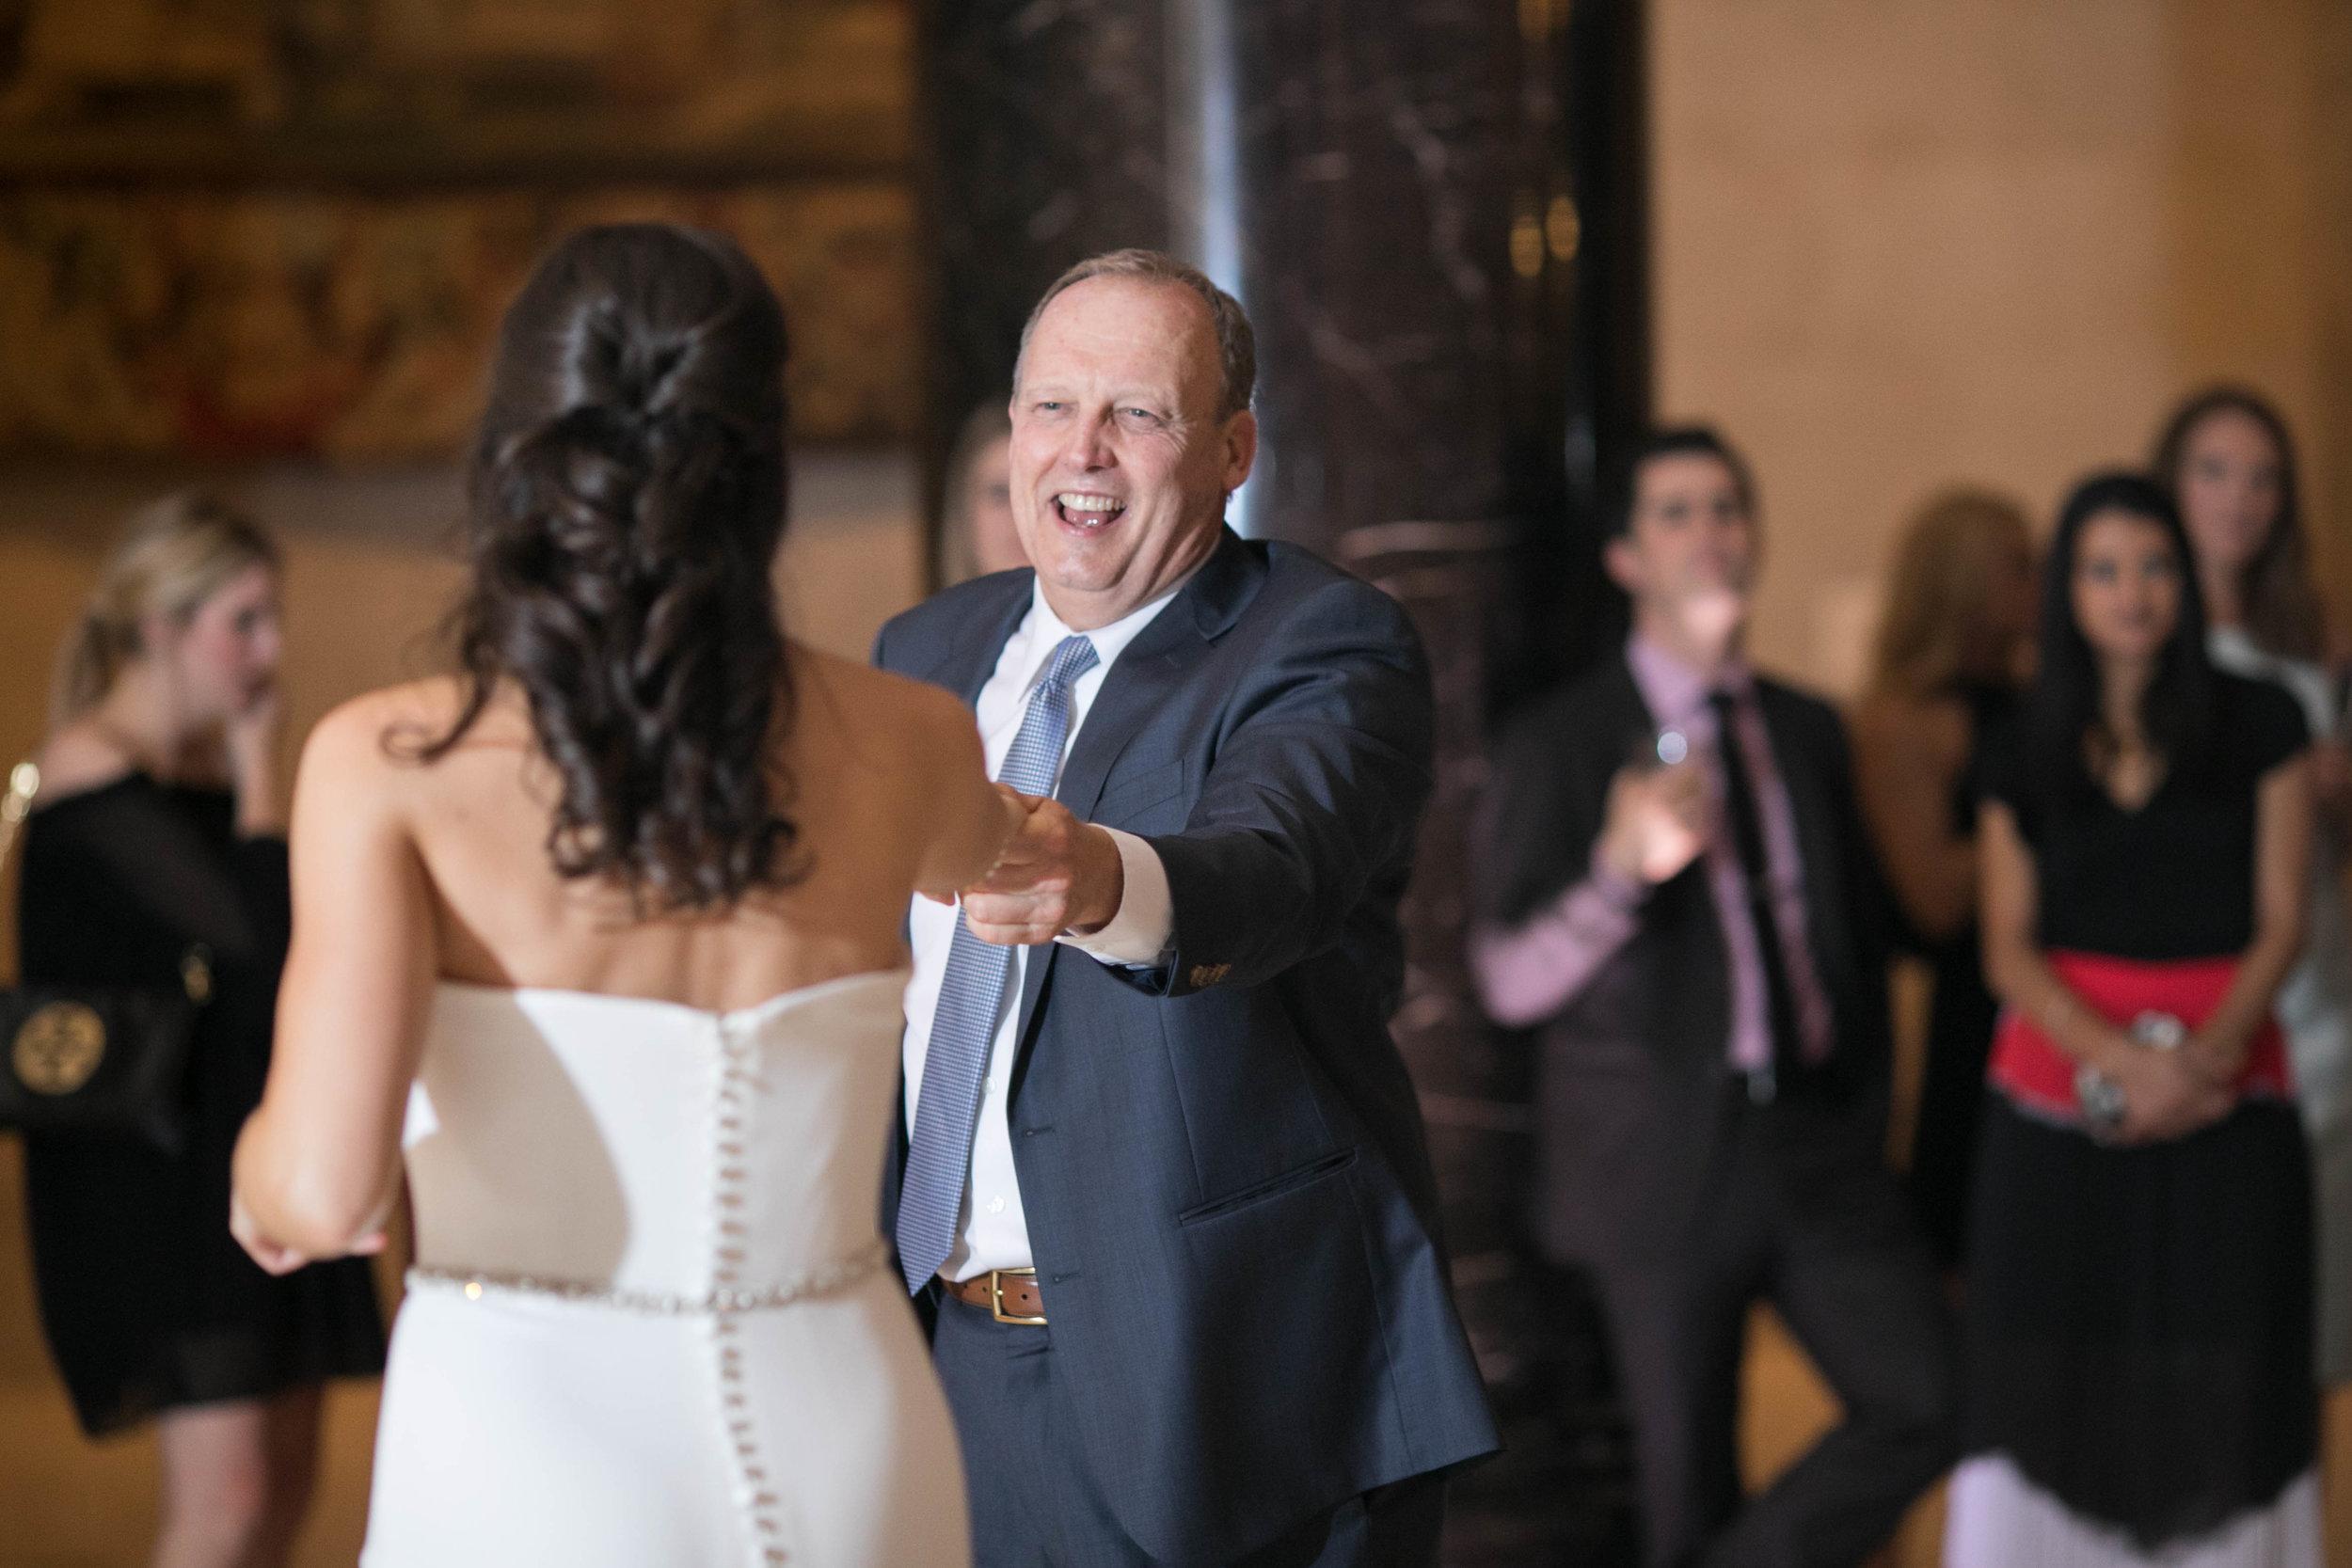 nelson-atkins-wedding-81.jpg